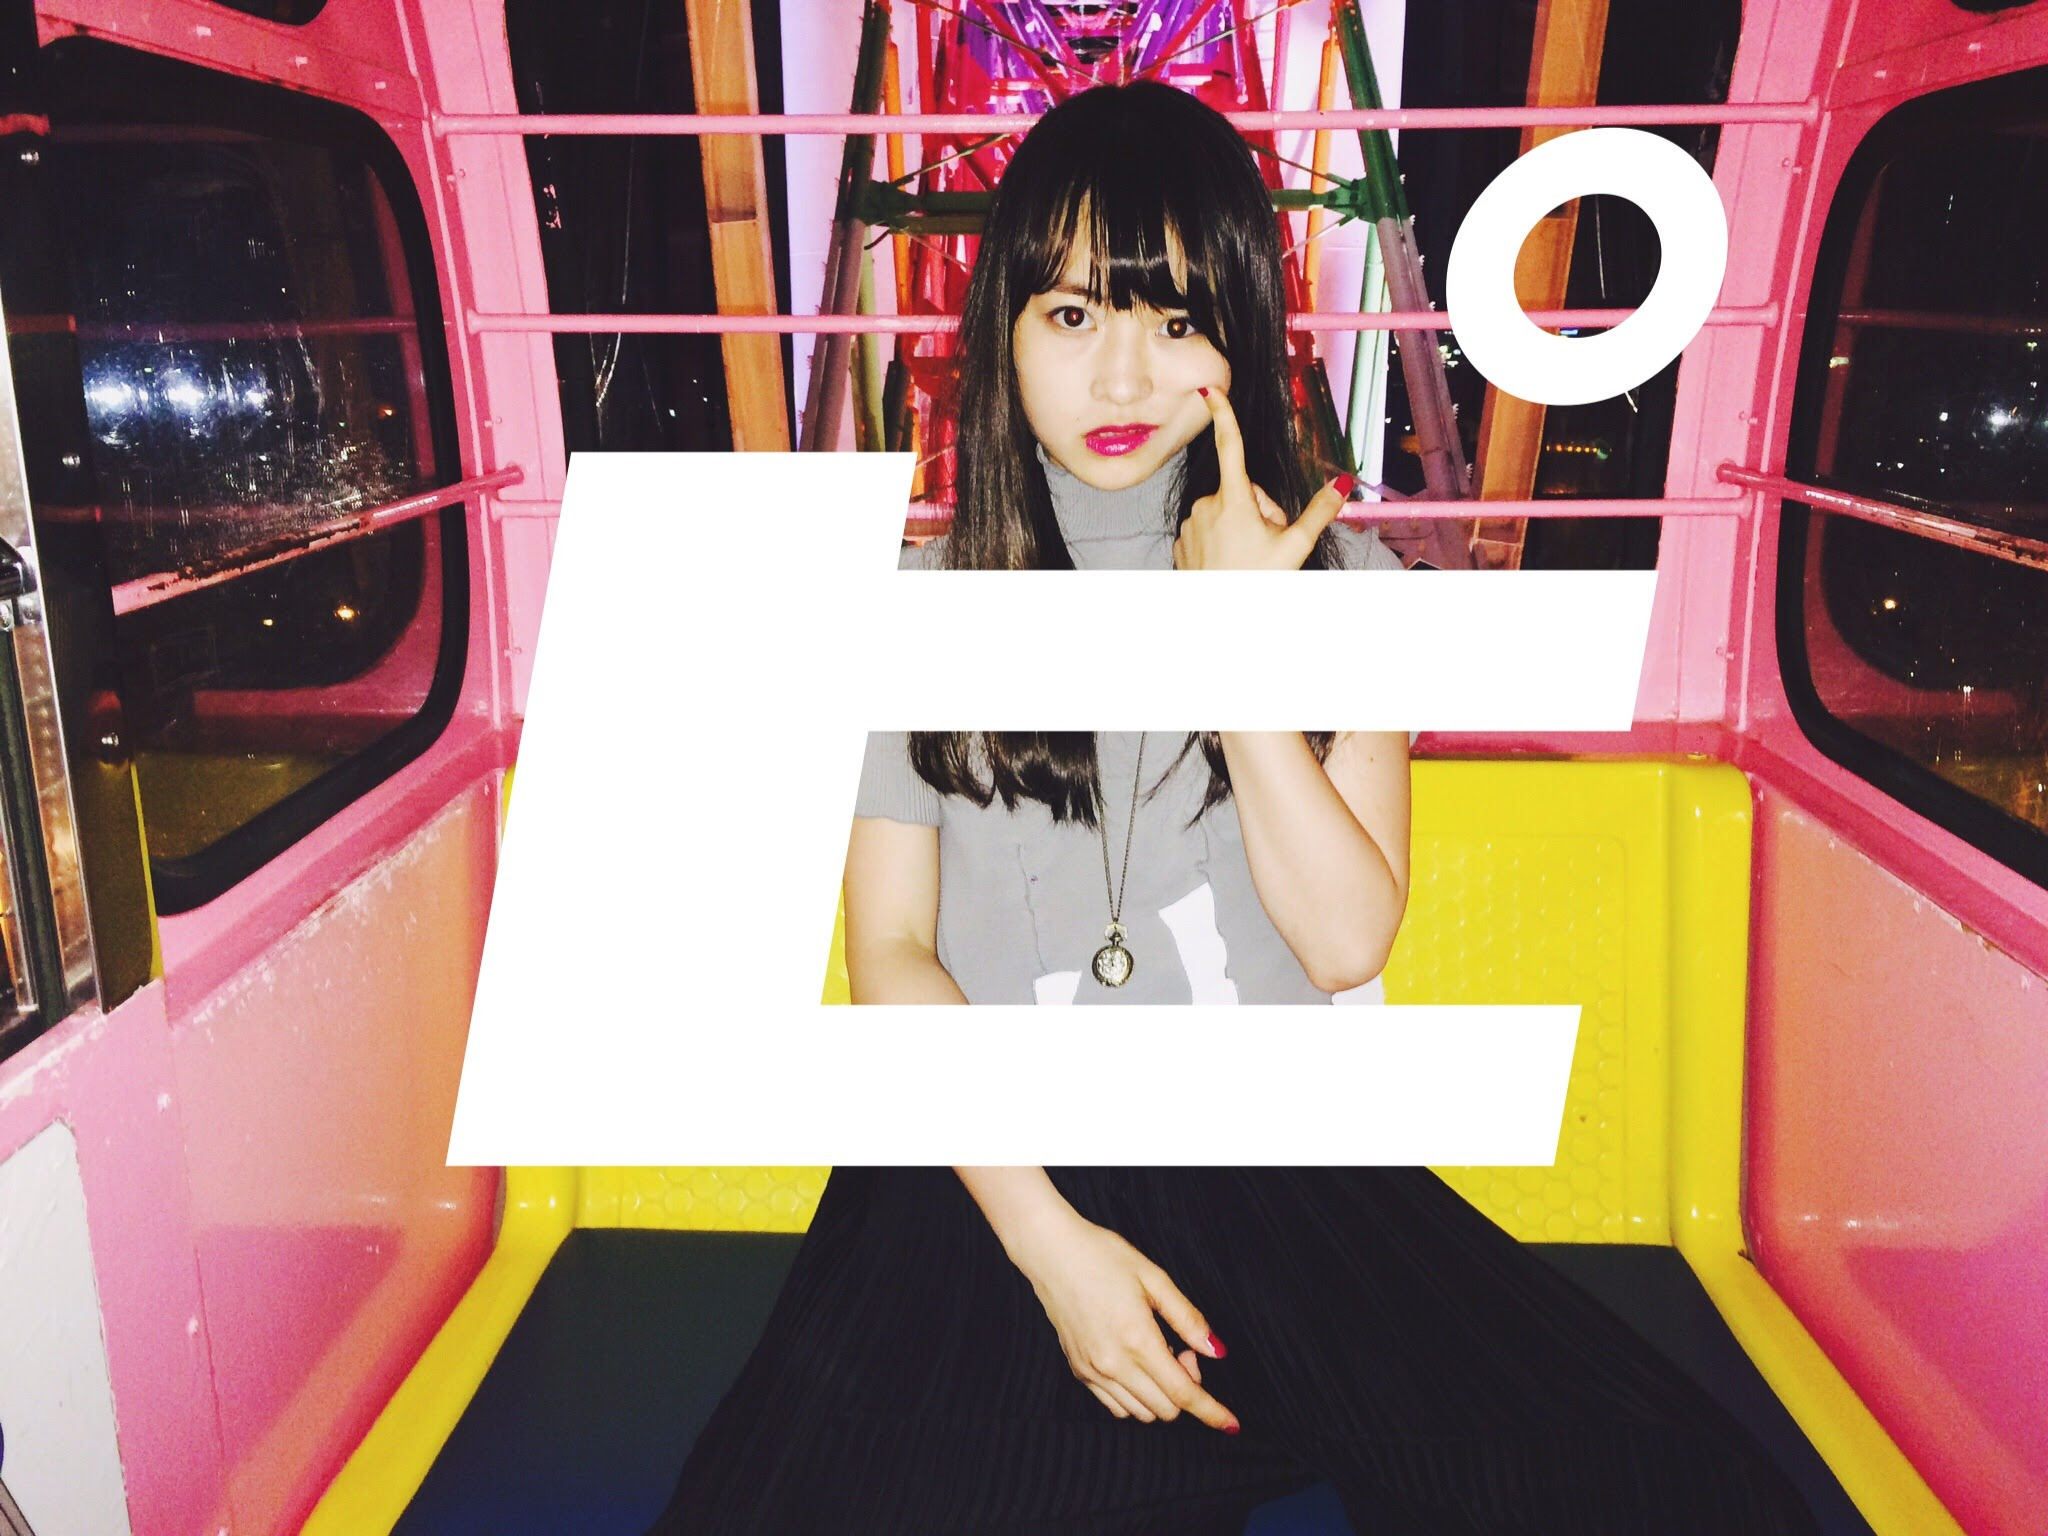 A Pop Idols 217446 Ito Marika Nogizaka46 伊藤万理華 乃木坂46